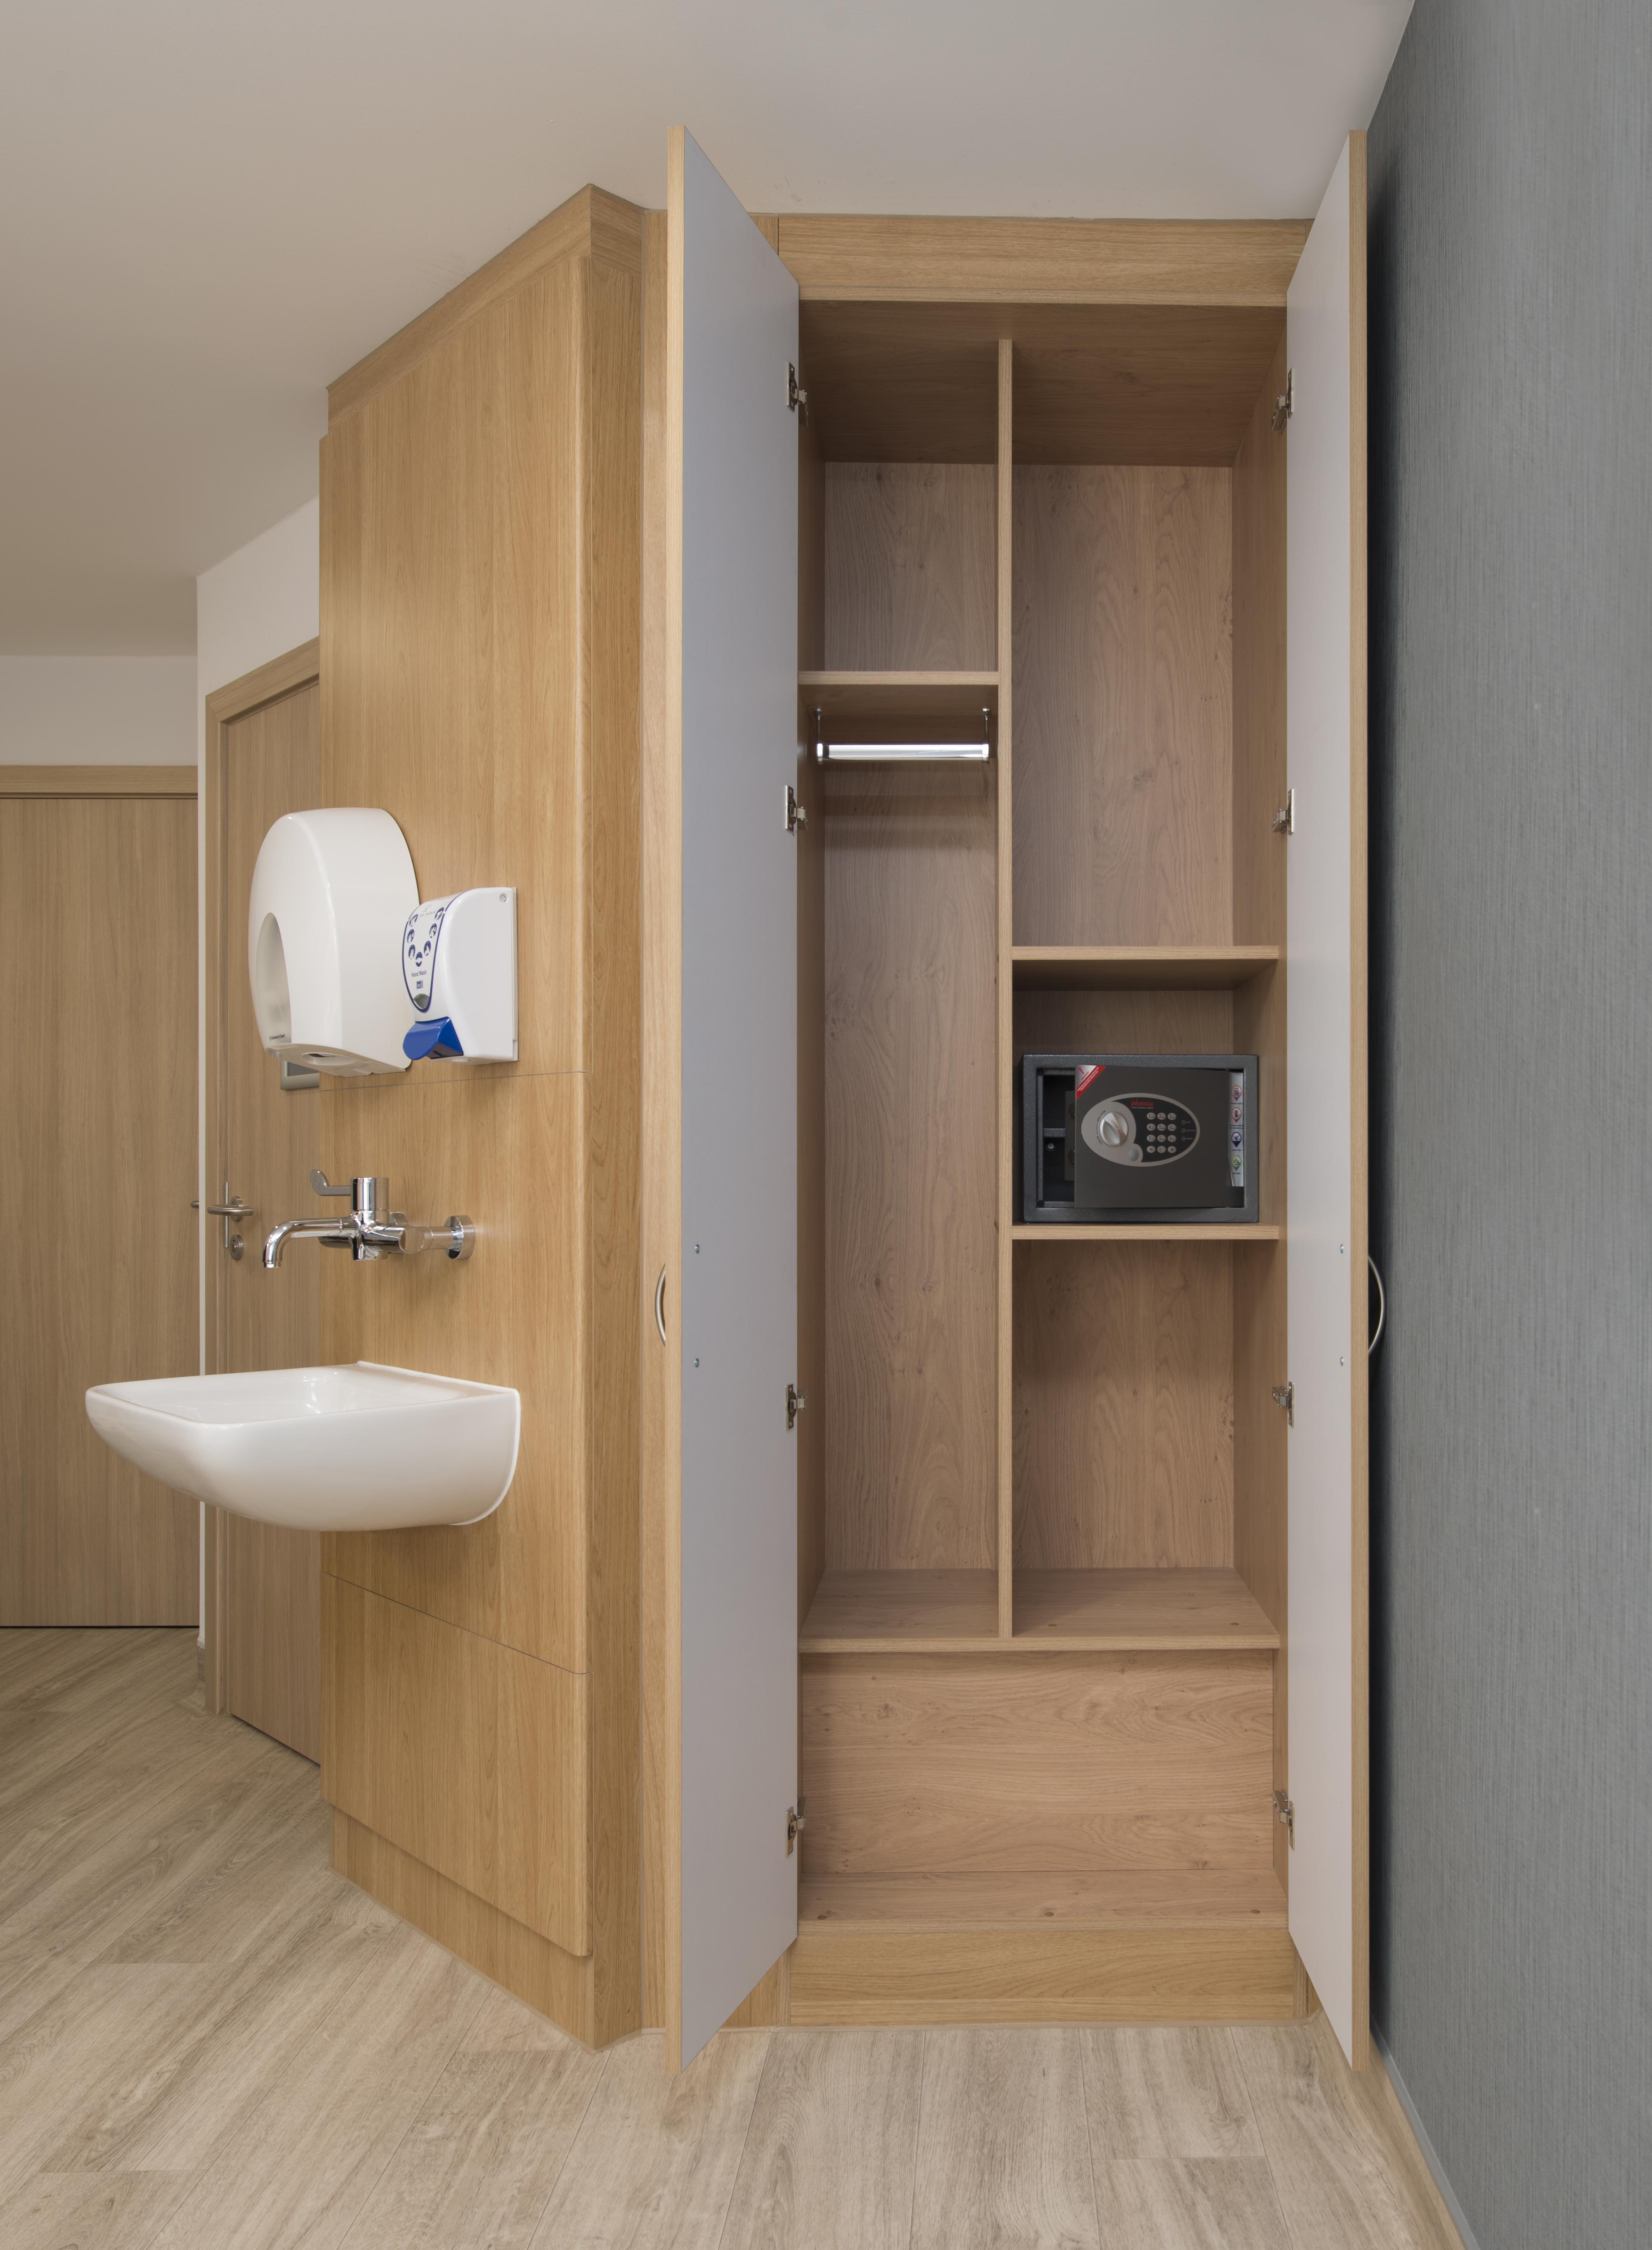 LiP Medical Furniture 3